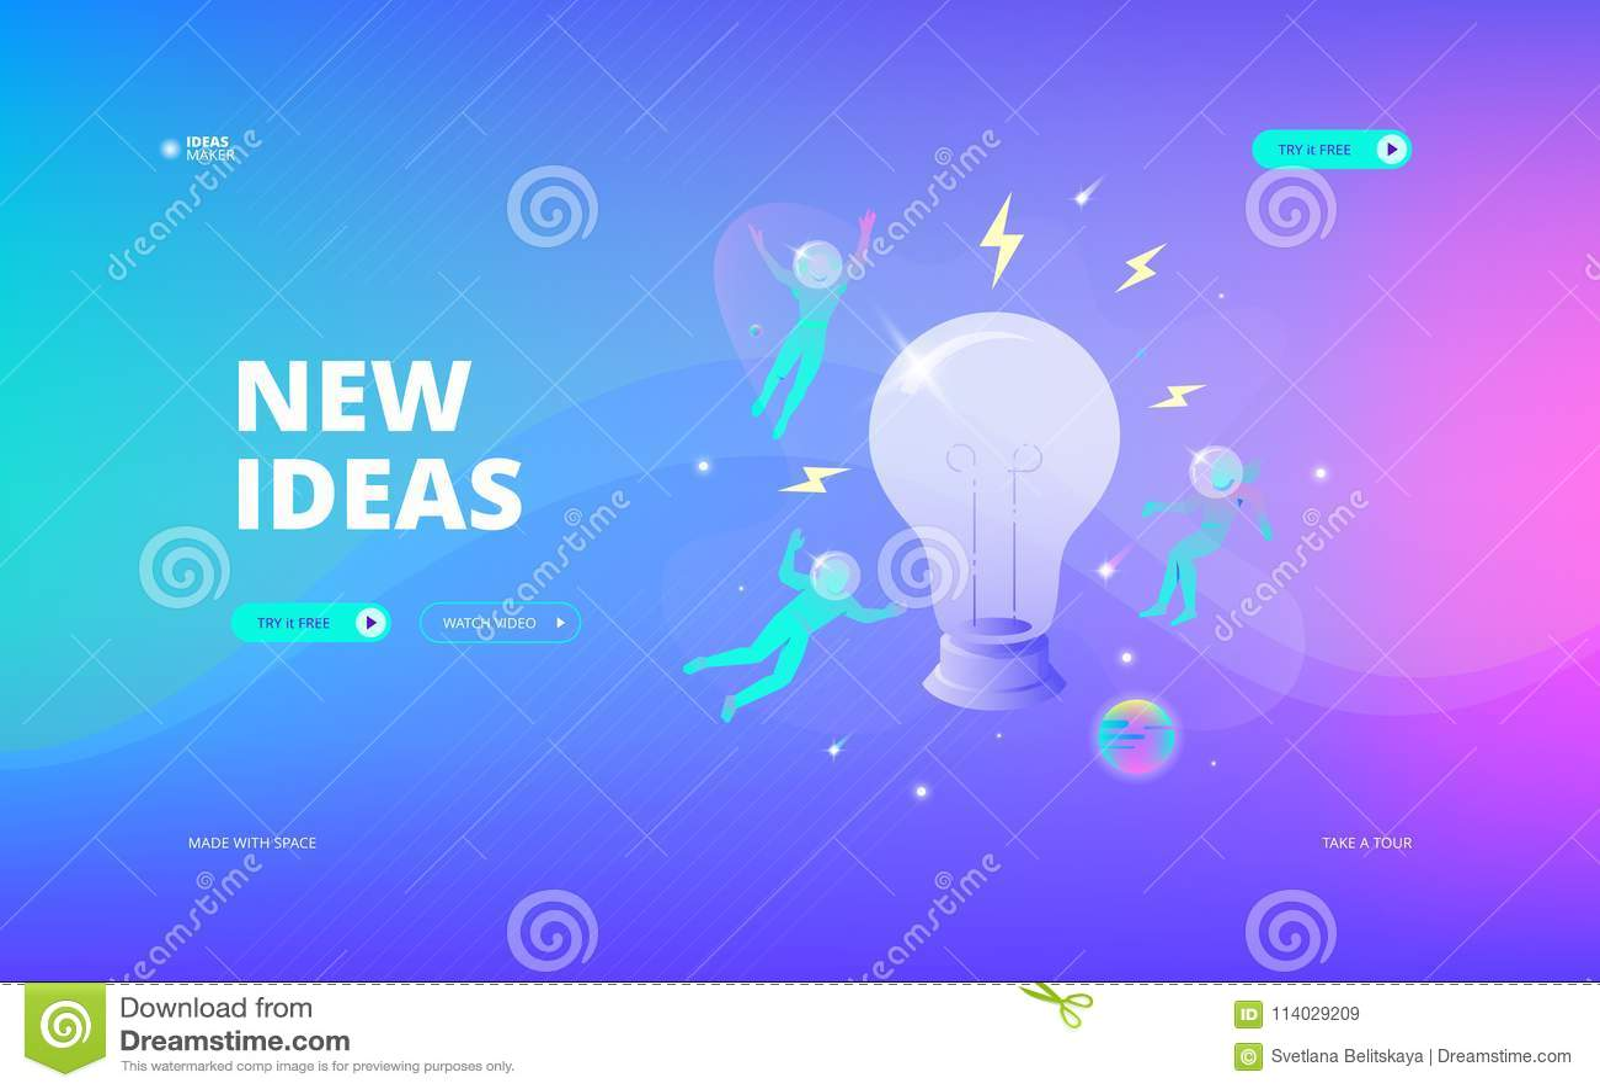 New ideas web banner stock vector  Illustration of cosmic